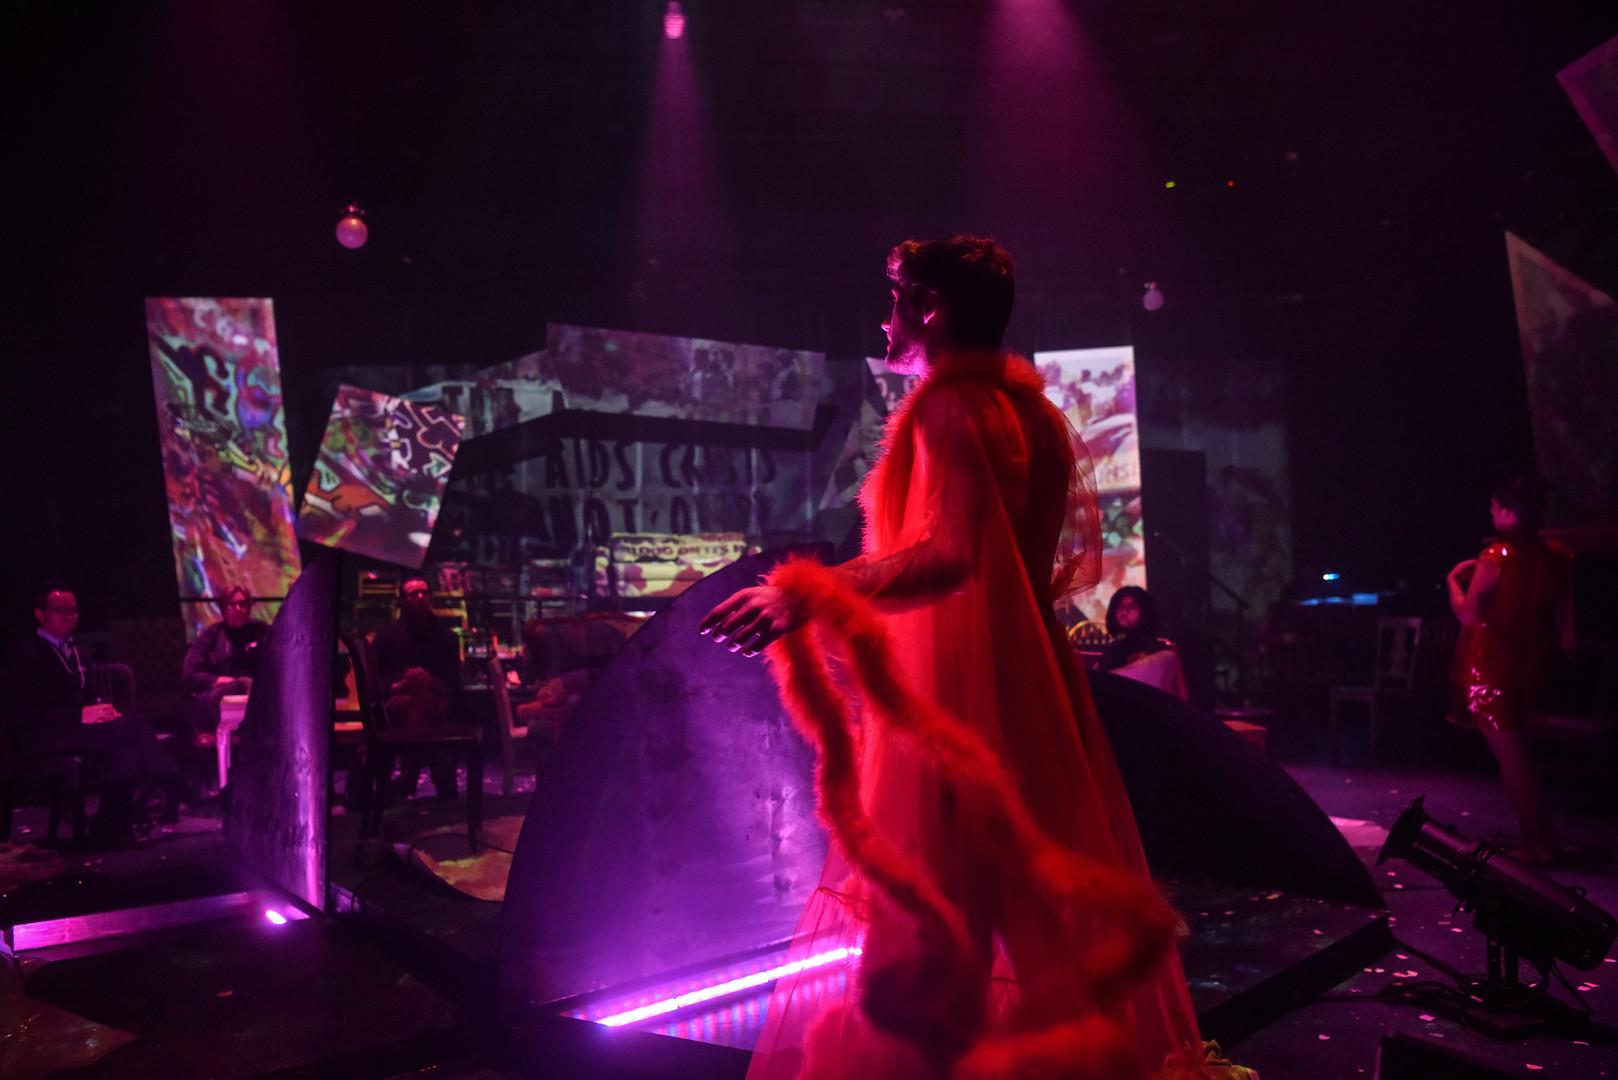 dance floor production photo